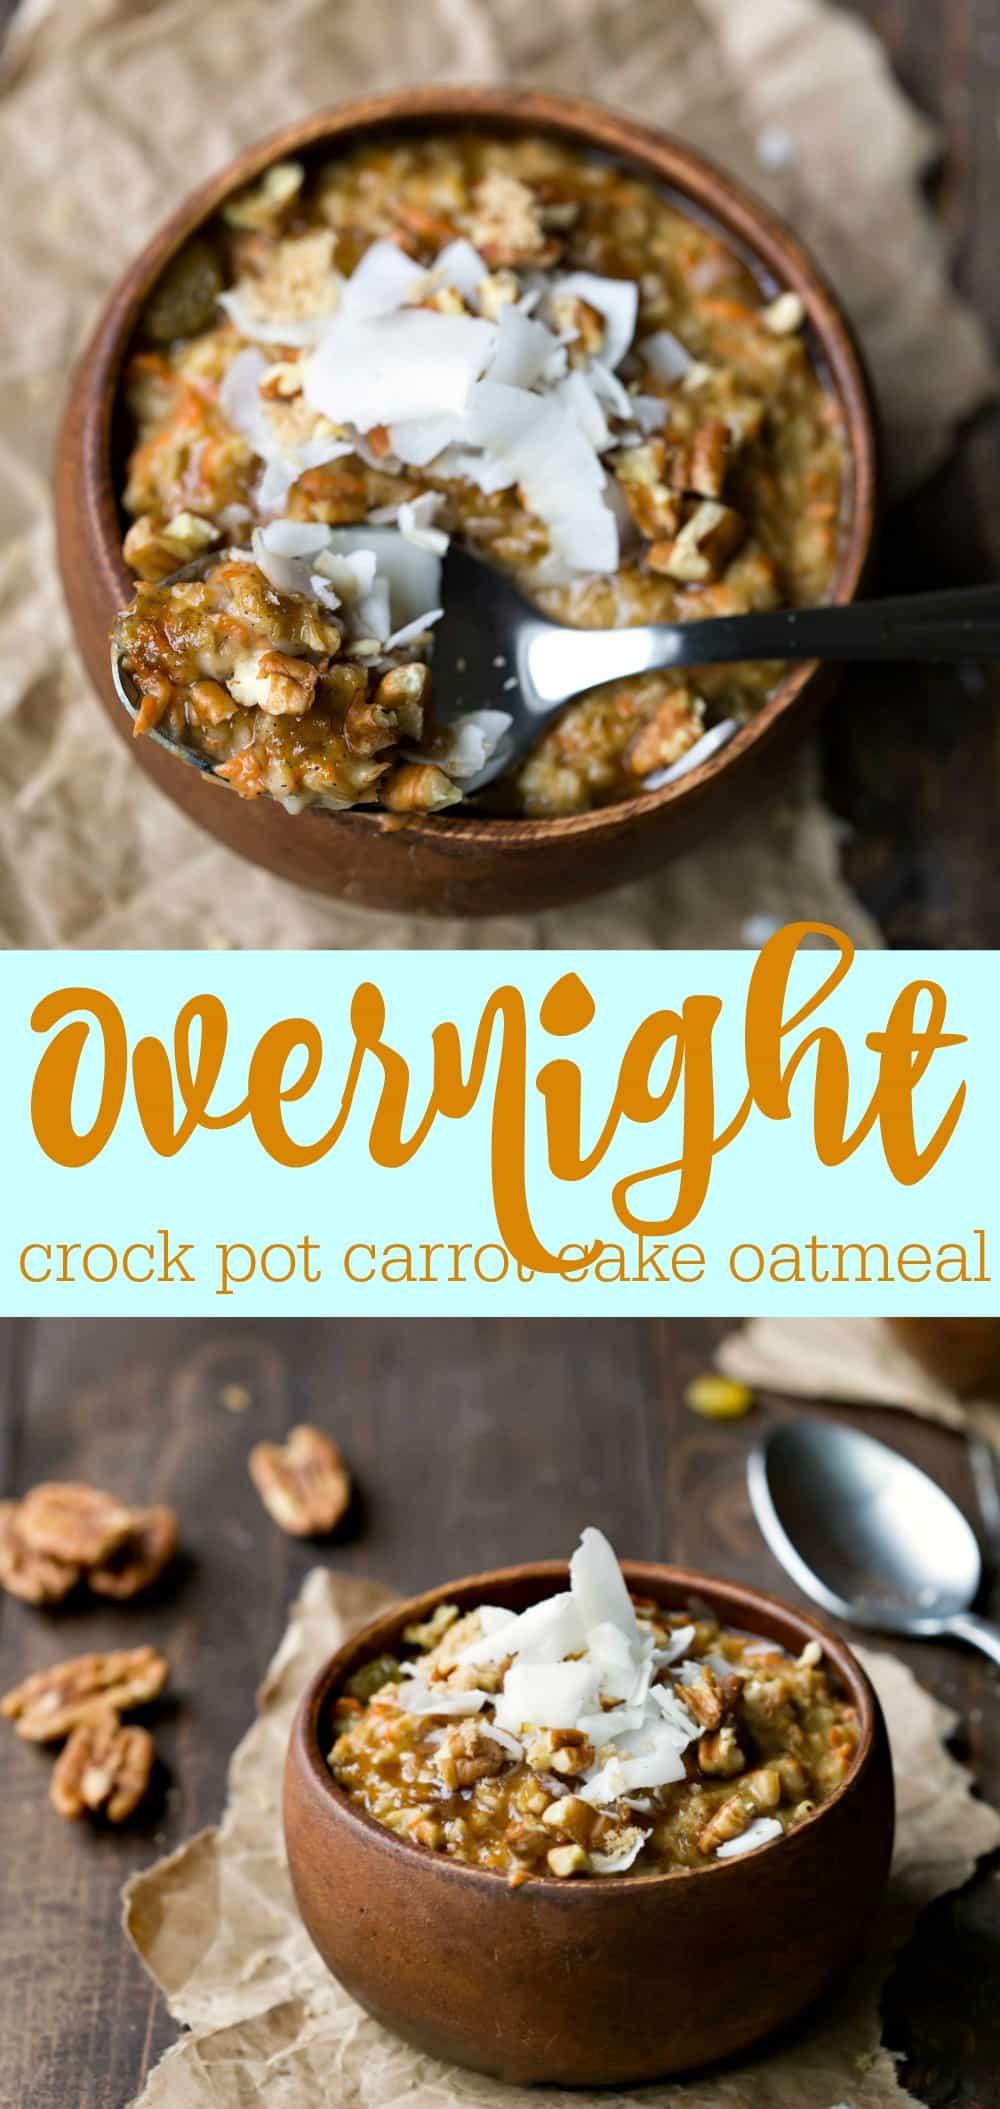 Overnight Crock Pot Carrot Cake Oatmeal